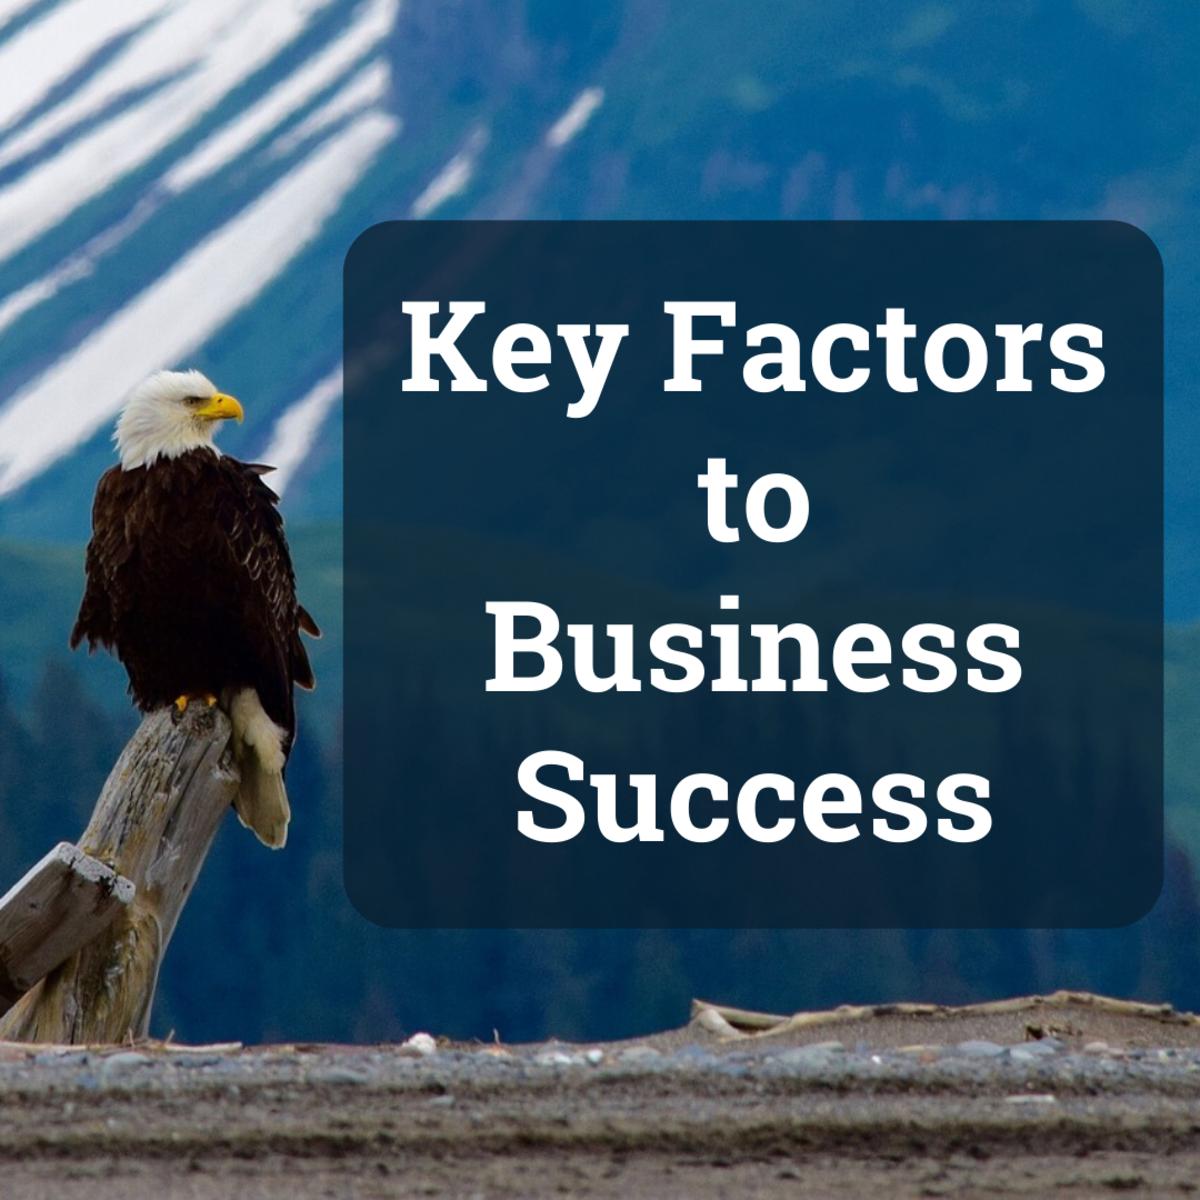 Factors That Contribute to Business Success